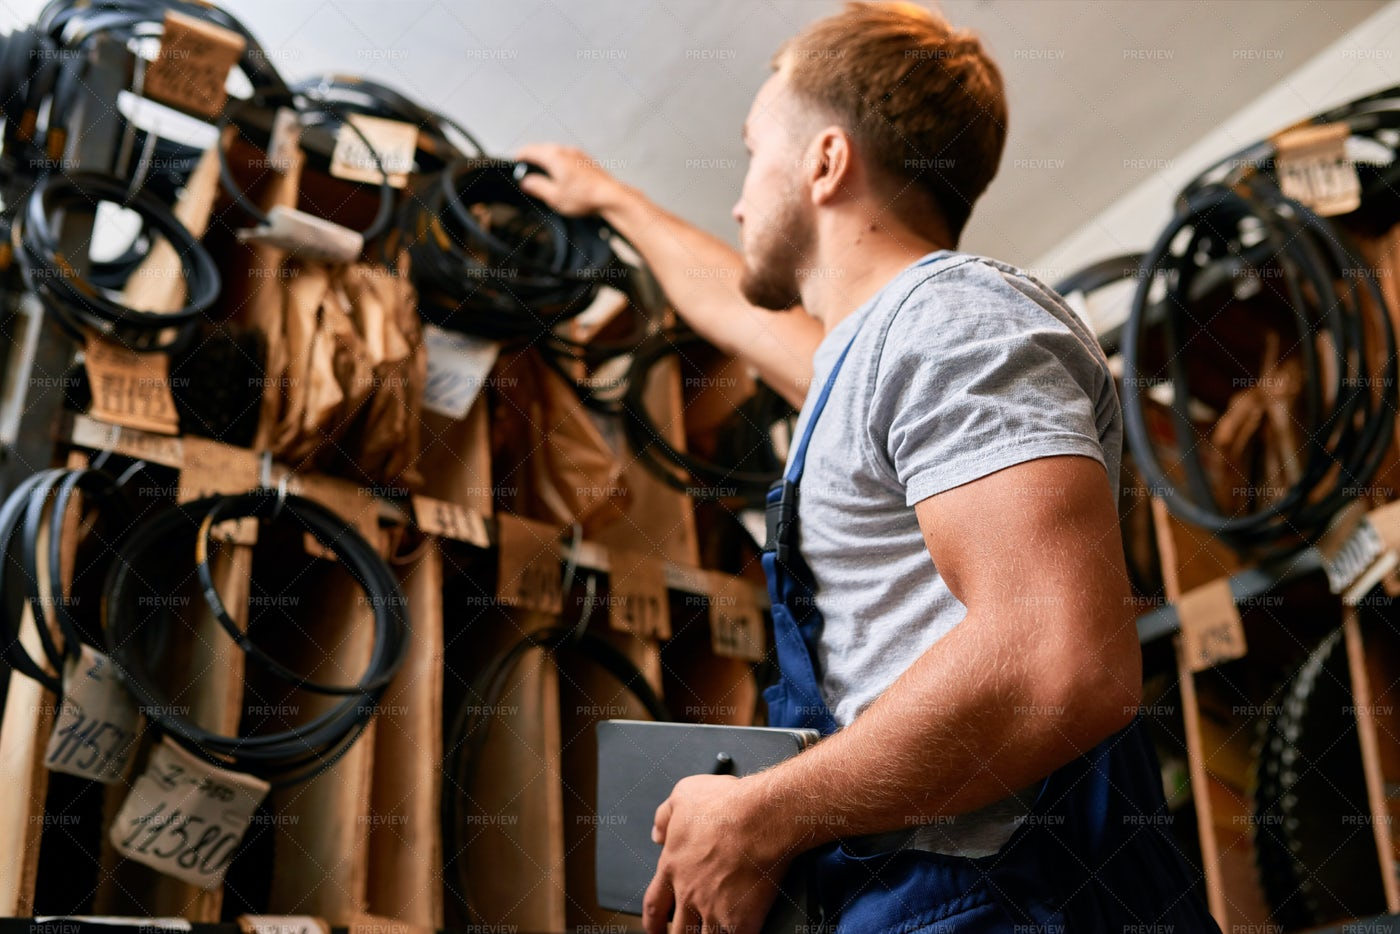 Mechanic Choosing Parts In Storage...: Stock Photos